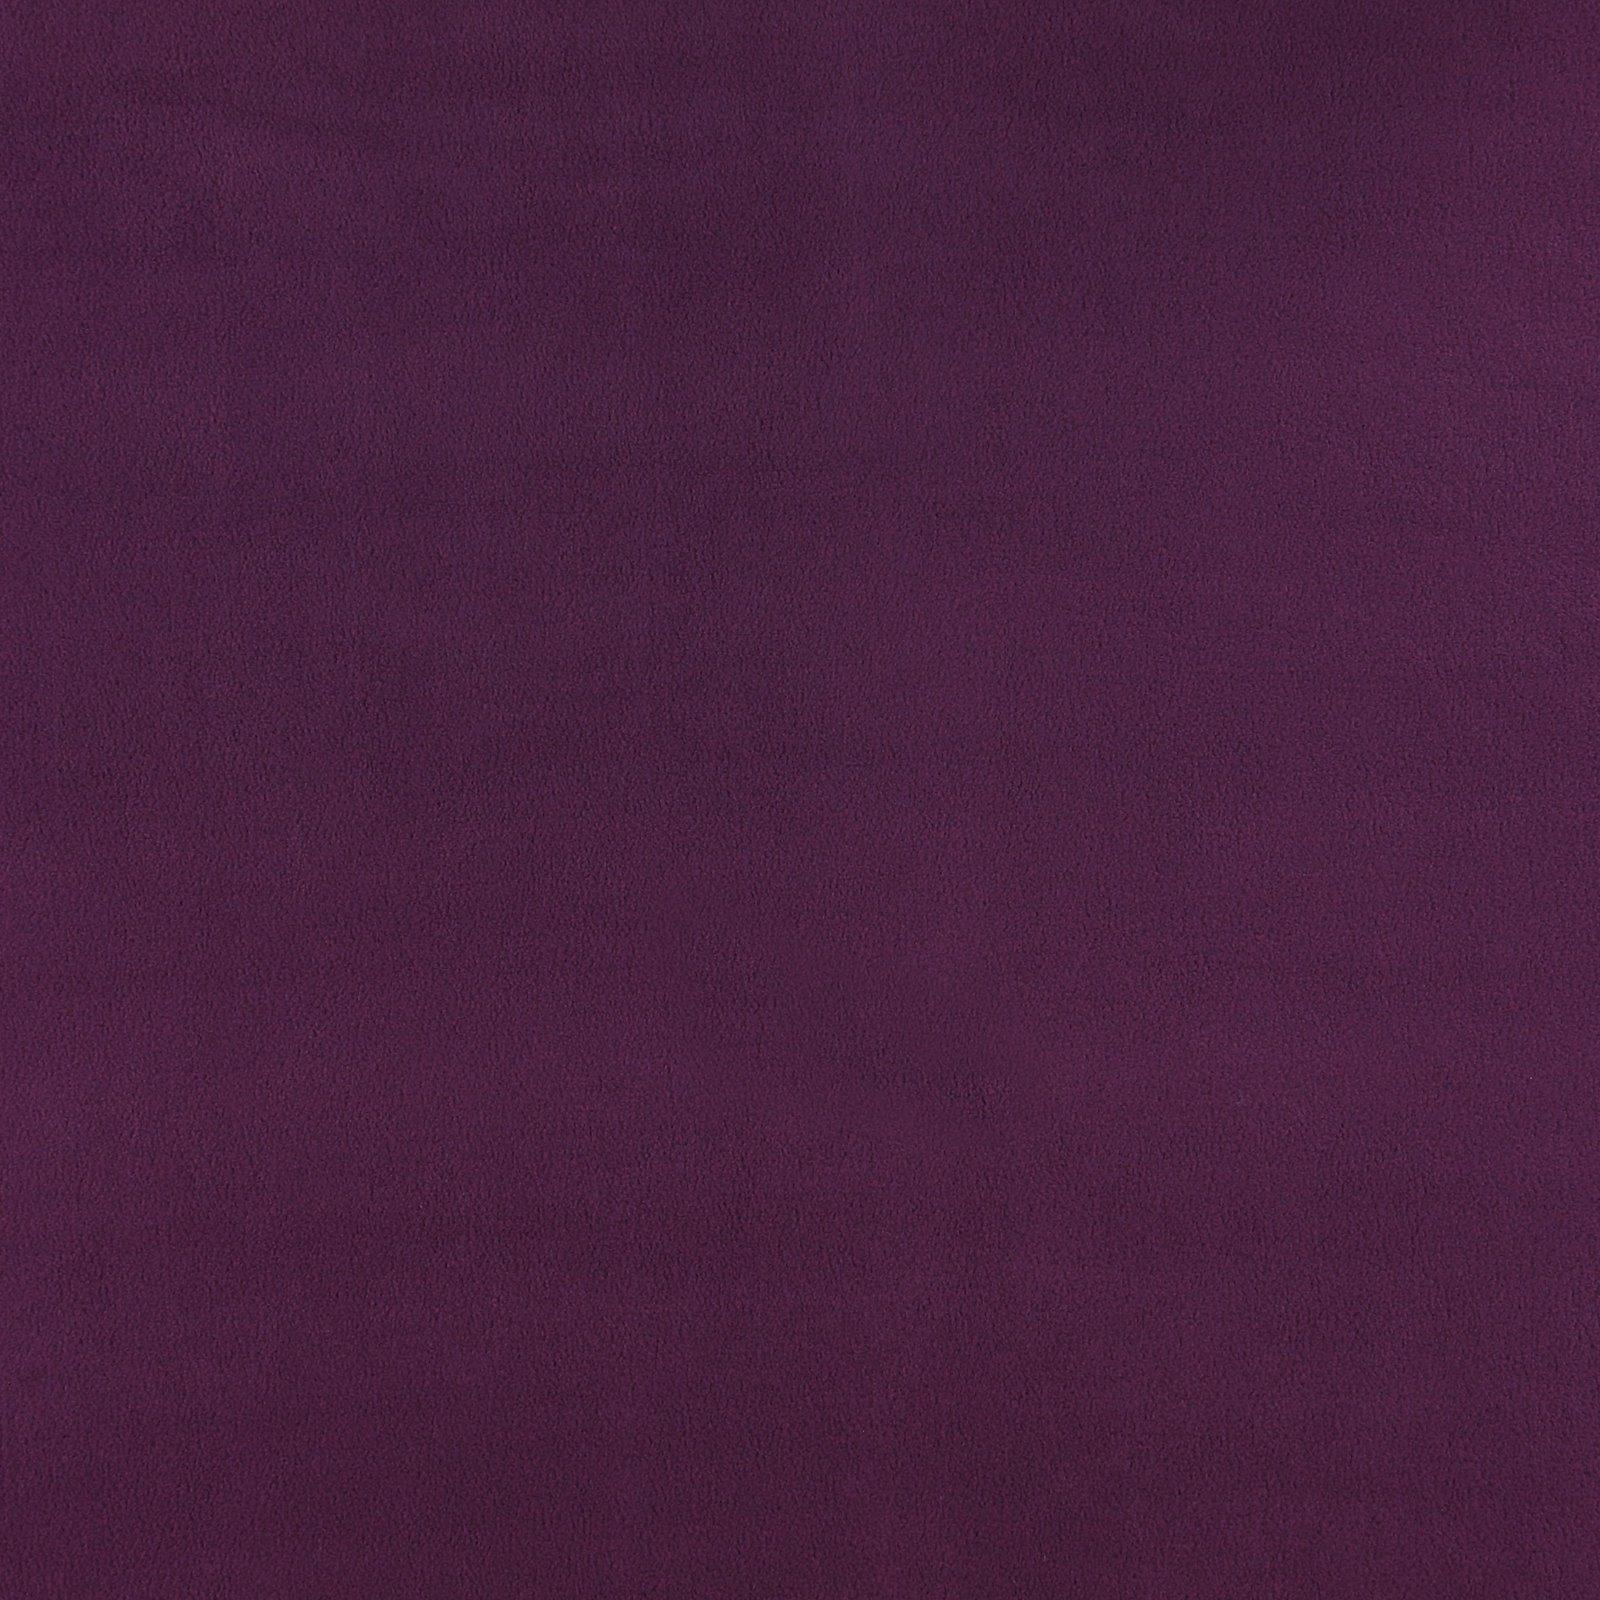 Polar fleece purple 220041_pack_solid